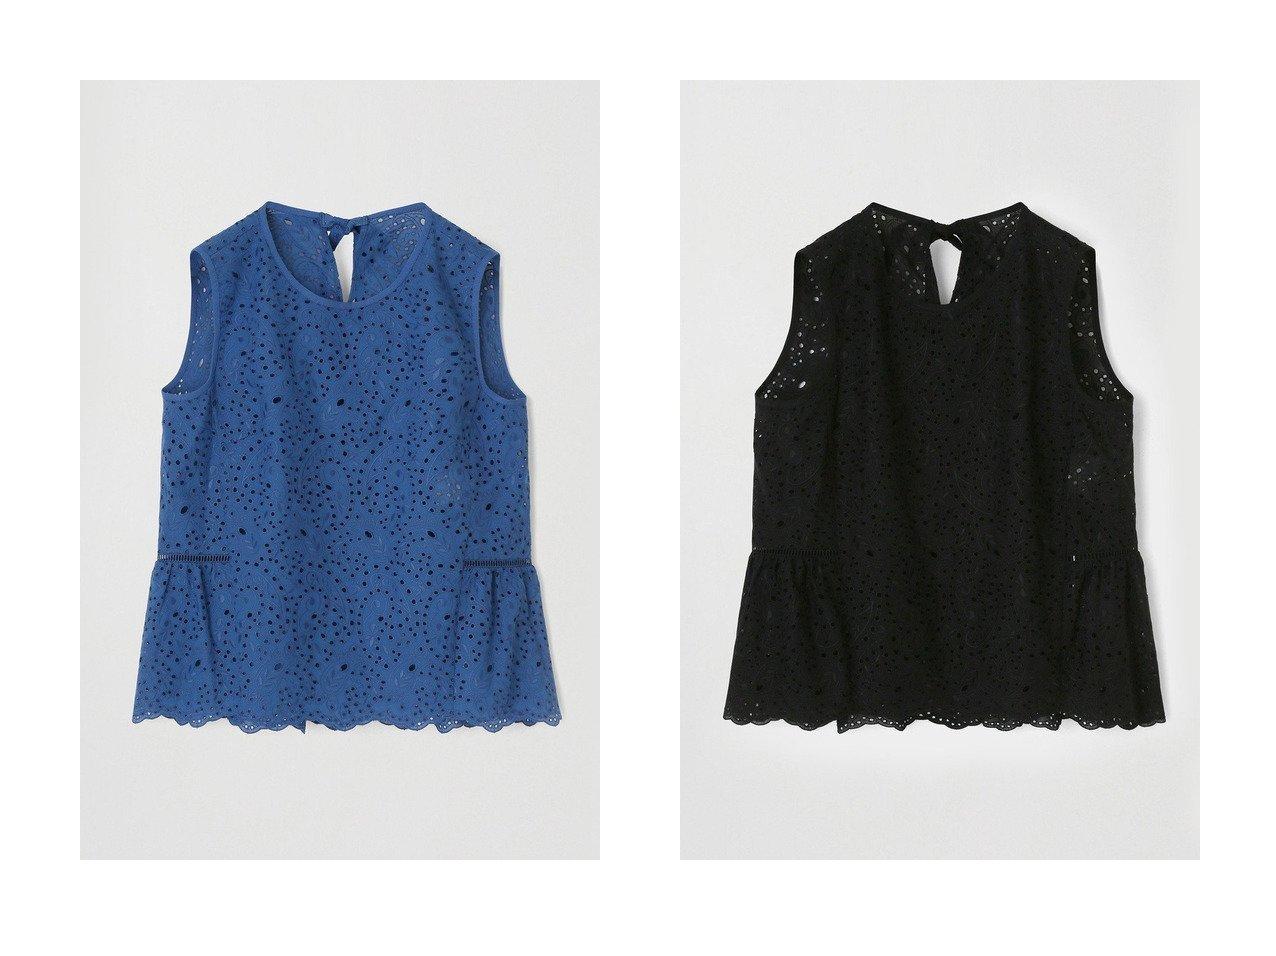 【ANAYI/アナイ】のペイズリーレースペプラムブラウス トップス・カットソーのおすすめ!人気、トレンド・レディースファッションの通販 おすすめで人気の流行・トレンド、ファッションの通販商品 メンズファッション・キッズファッション・インテリア・家具・レディースファッション・服の通販 founy(ファニー) https://founy.com/ ファッション Fashion レディースファッション WOMEN トップス Tops Tshirt キャミソール / ノースリーブ No Sleeves シャツ/ブラウス Shirts Blouses デニム ノースリーブ フェミニン ペプラム リボン レース 春 Spring |ID:crp329100000012548